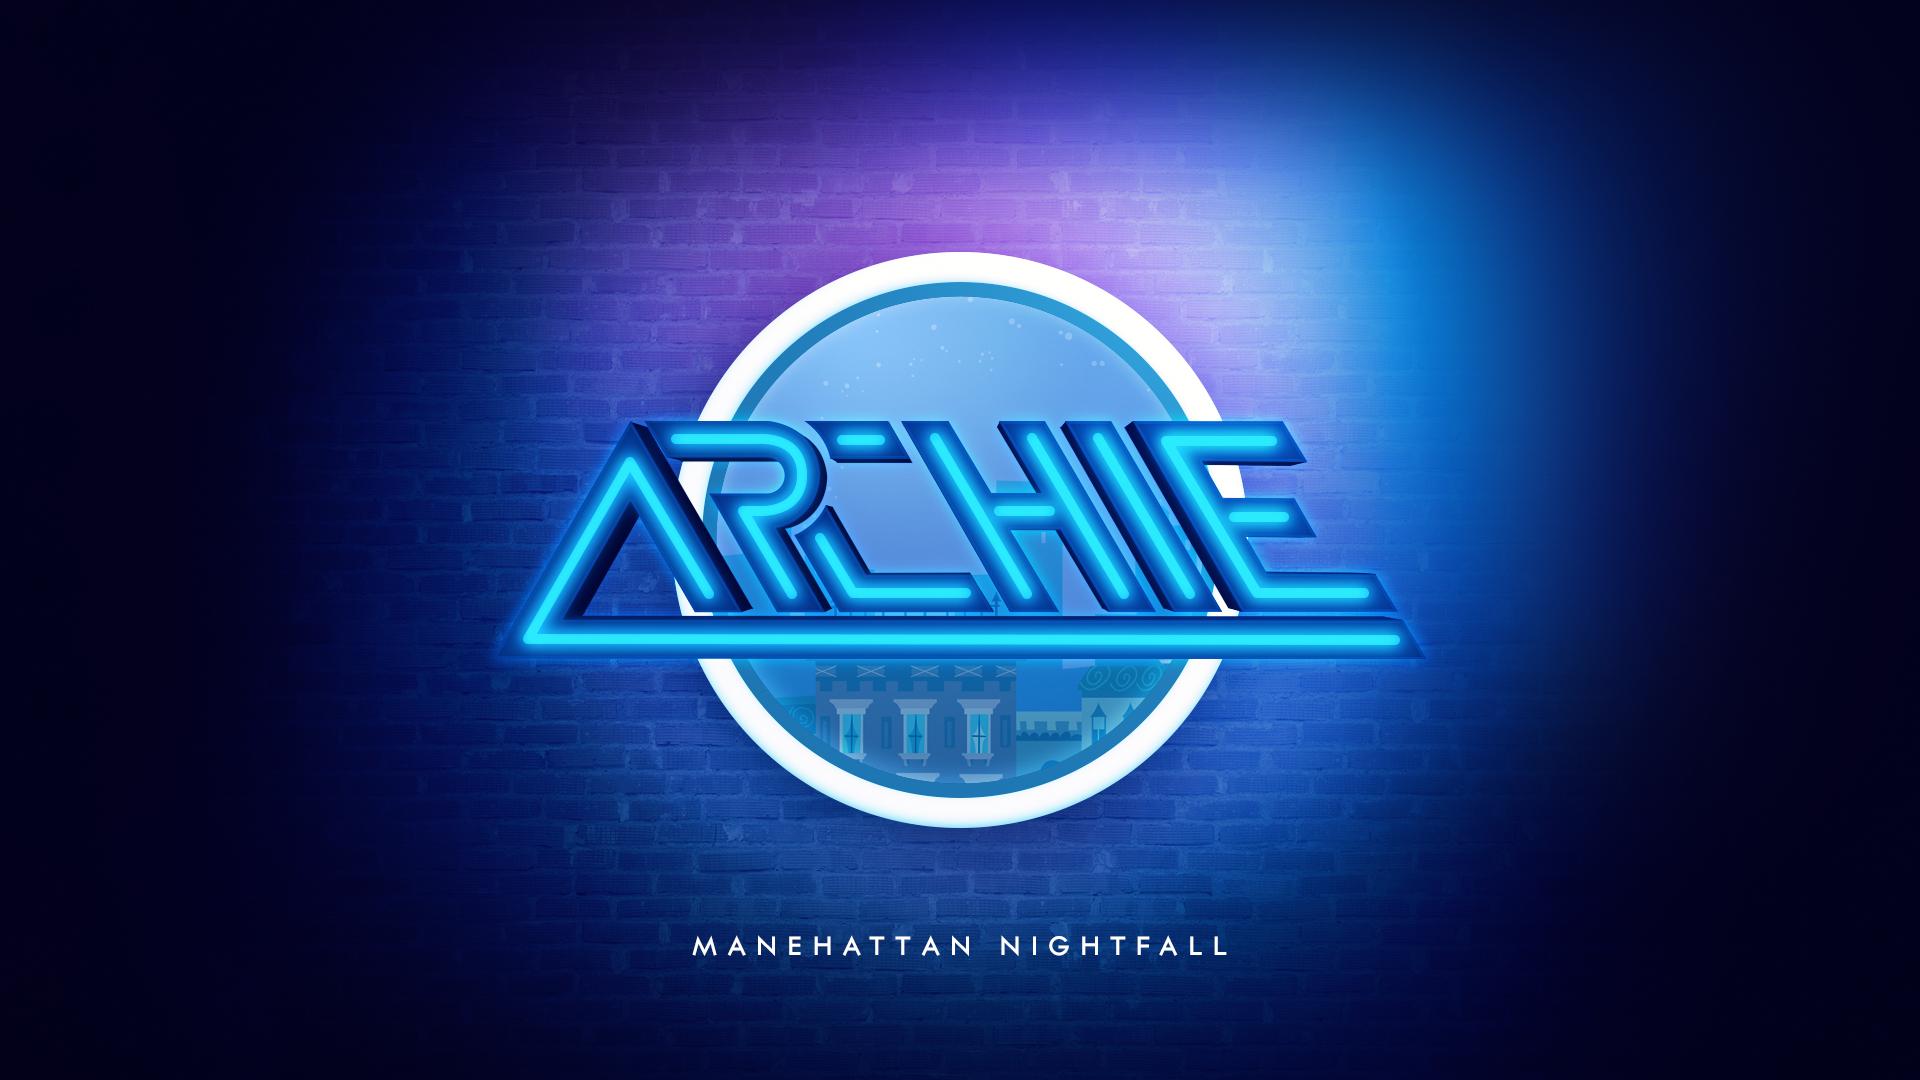 Archie - Manehattan Nightfall by AdrianImpalaMata